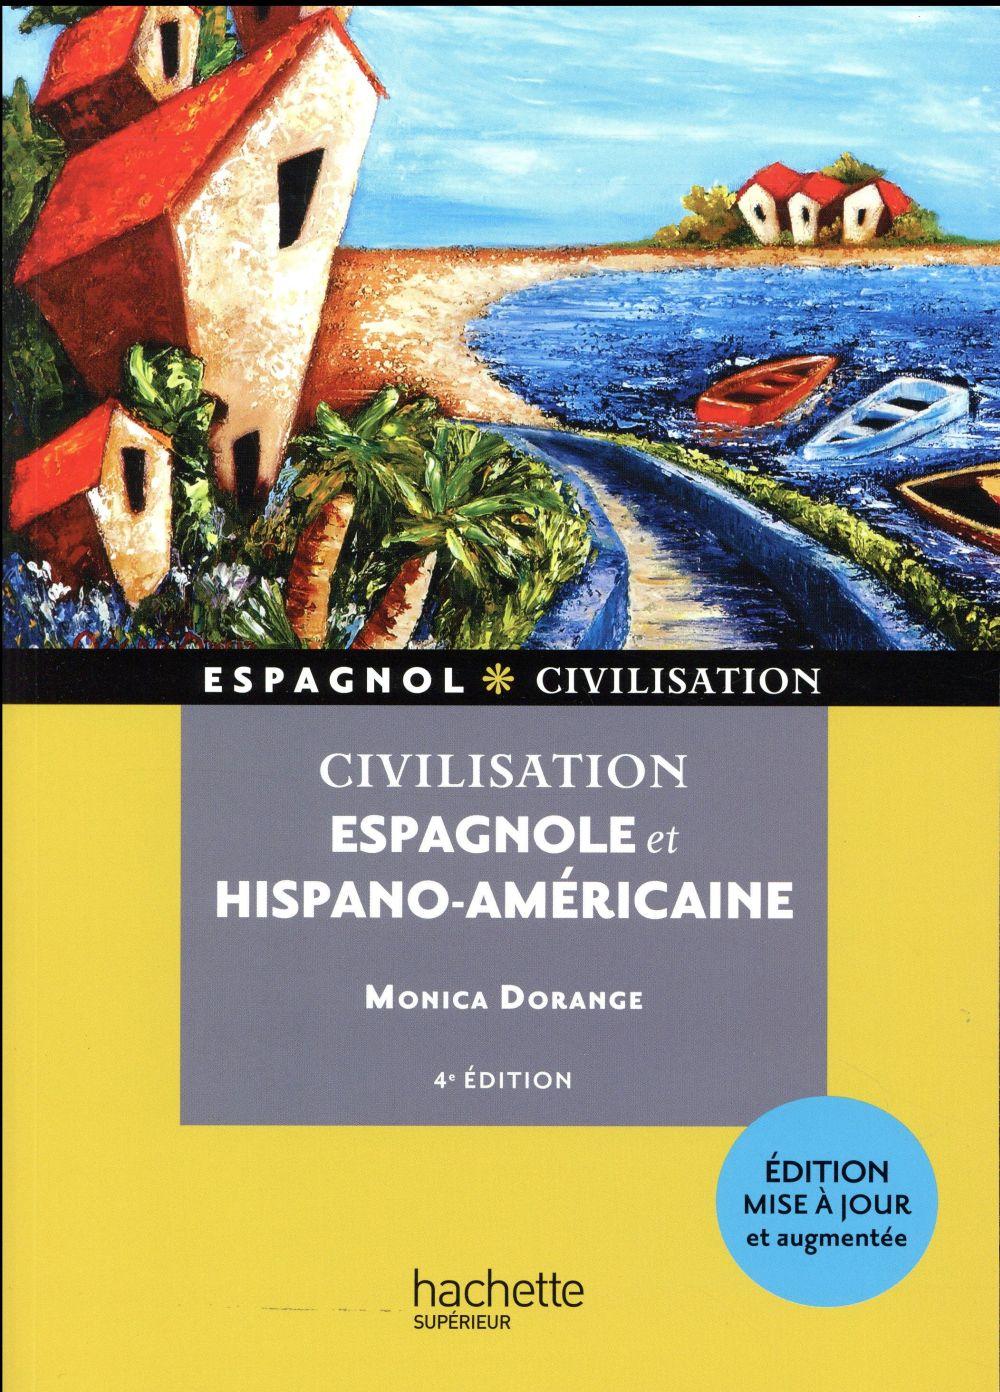 CIVILISATION ESPAGNOLE ET HISPANO-AMERICAINE